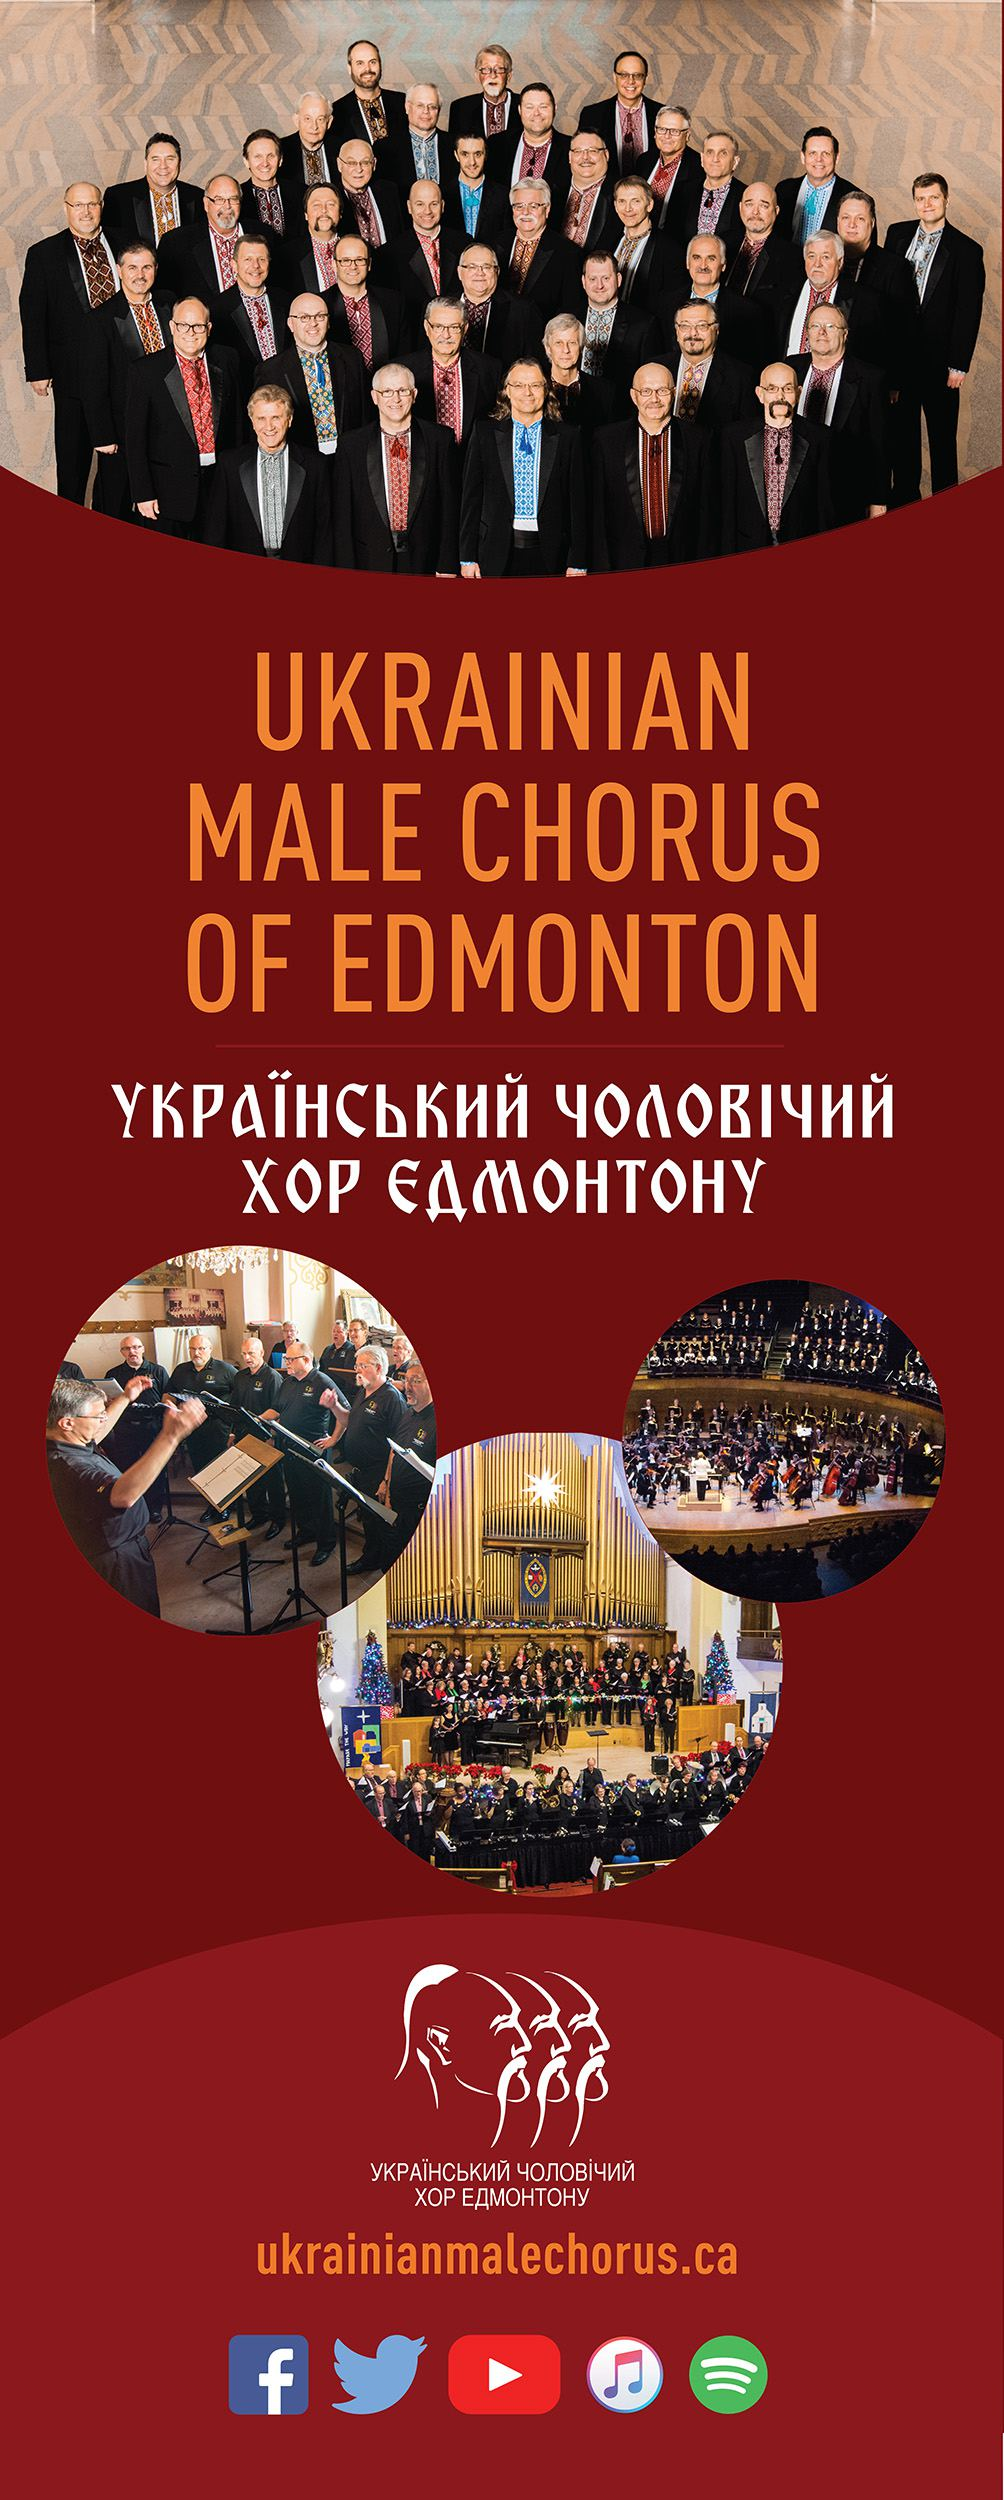 Ukrainian Male Chorus Of Edmonton banner by Urban Block Media in Ottawa